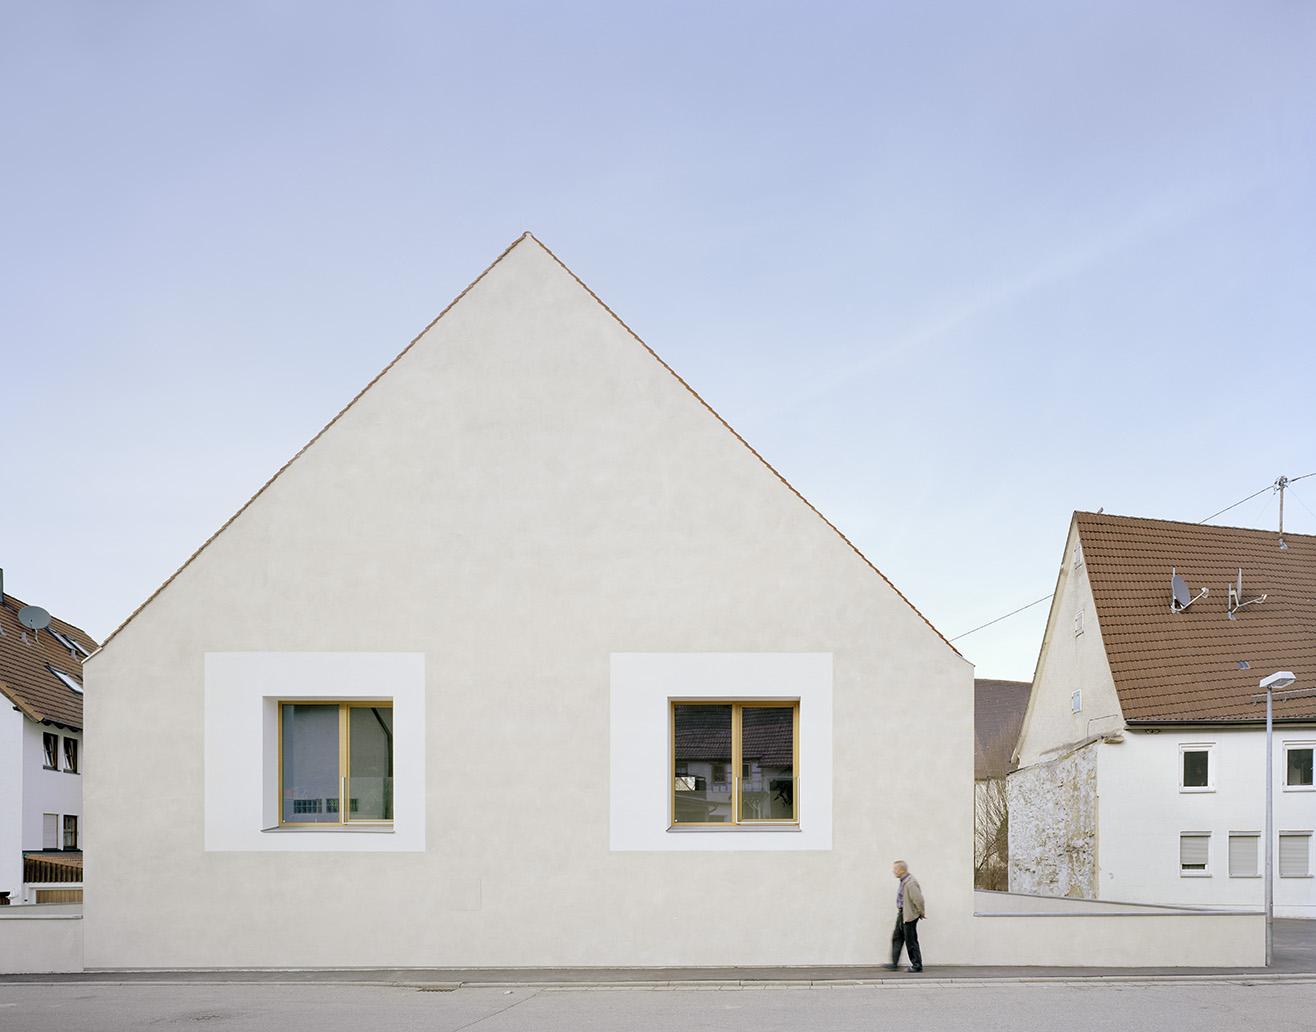 kaestle&ocker - Kath. Gemeindehaus St. Laurentius